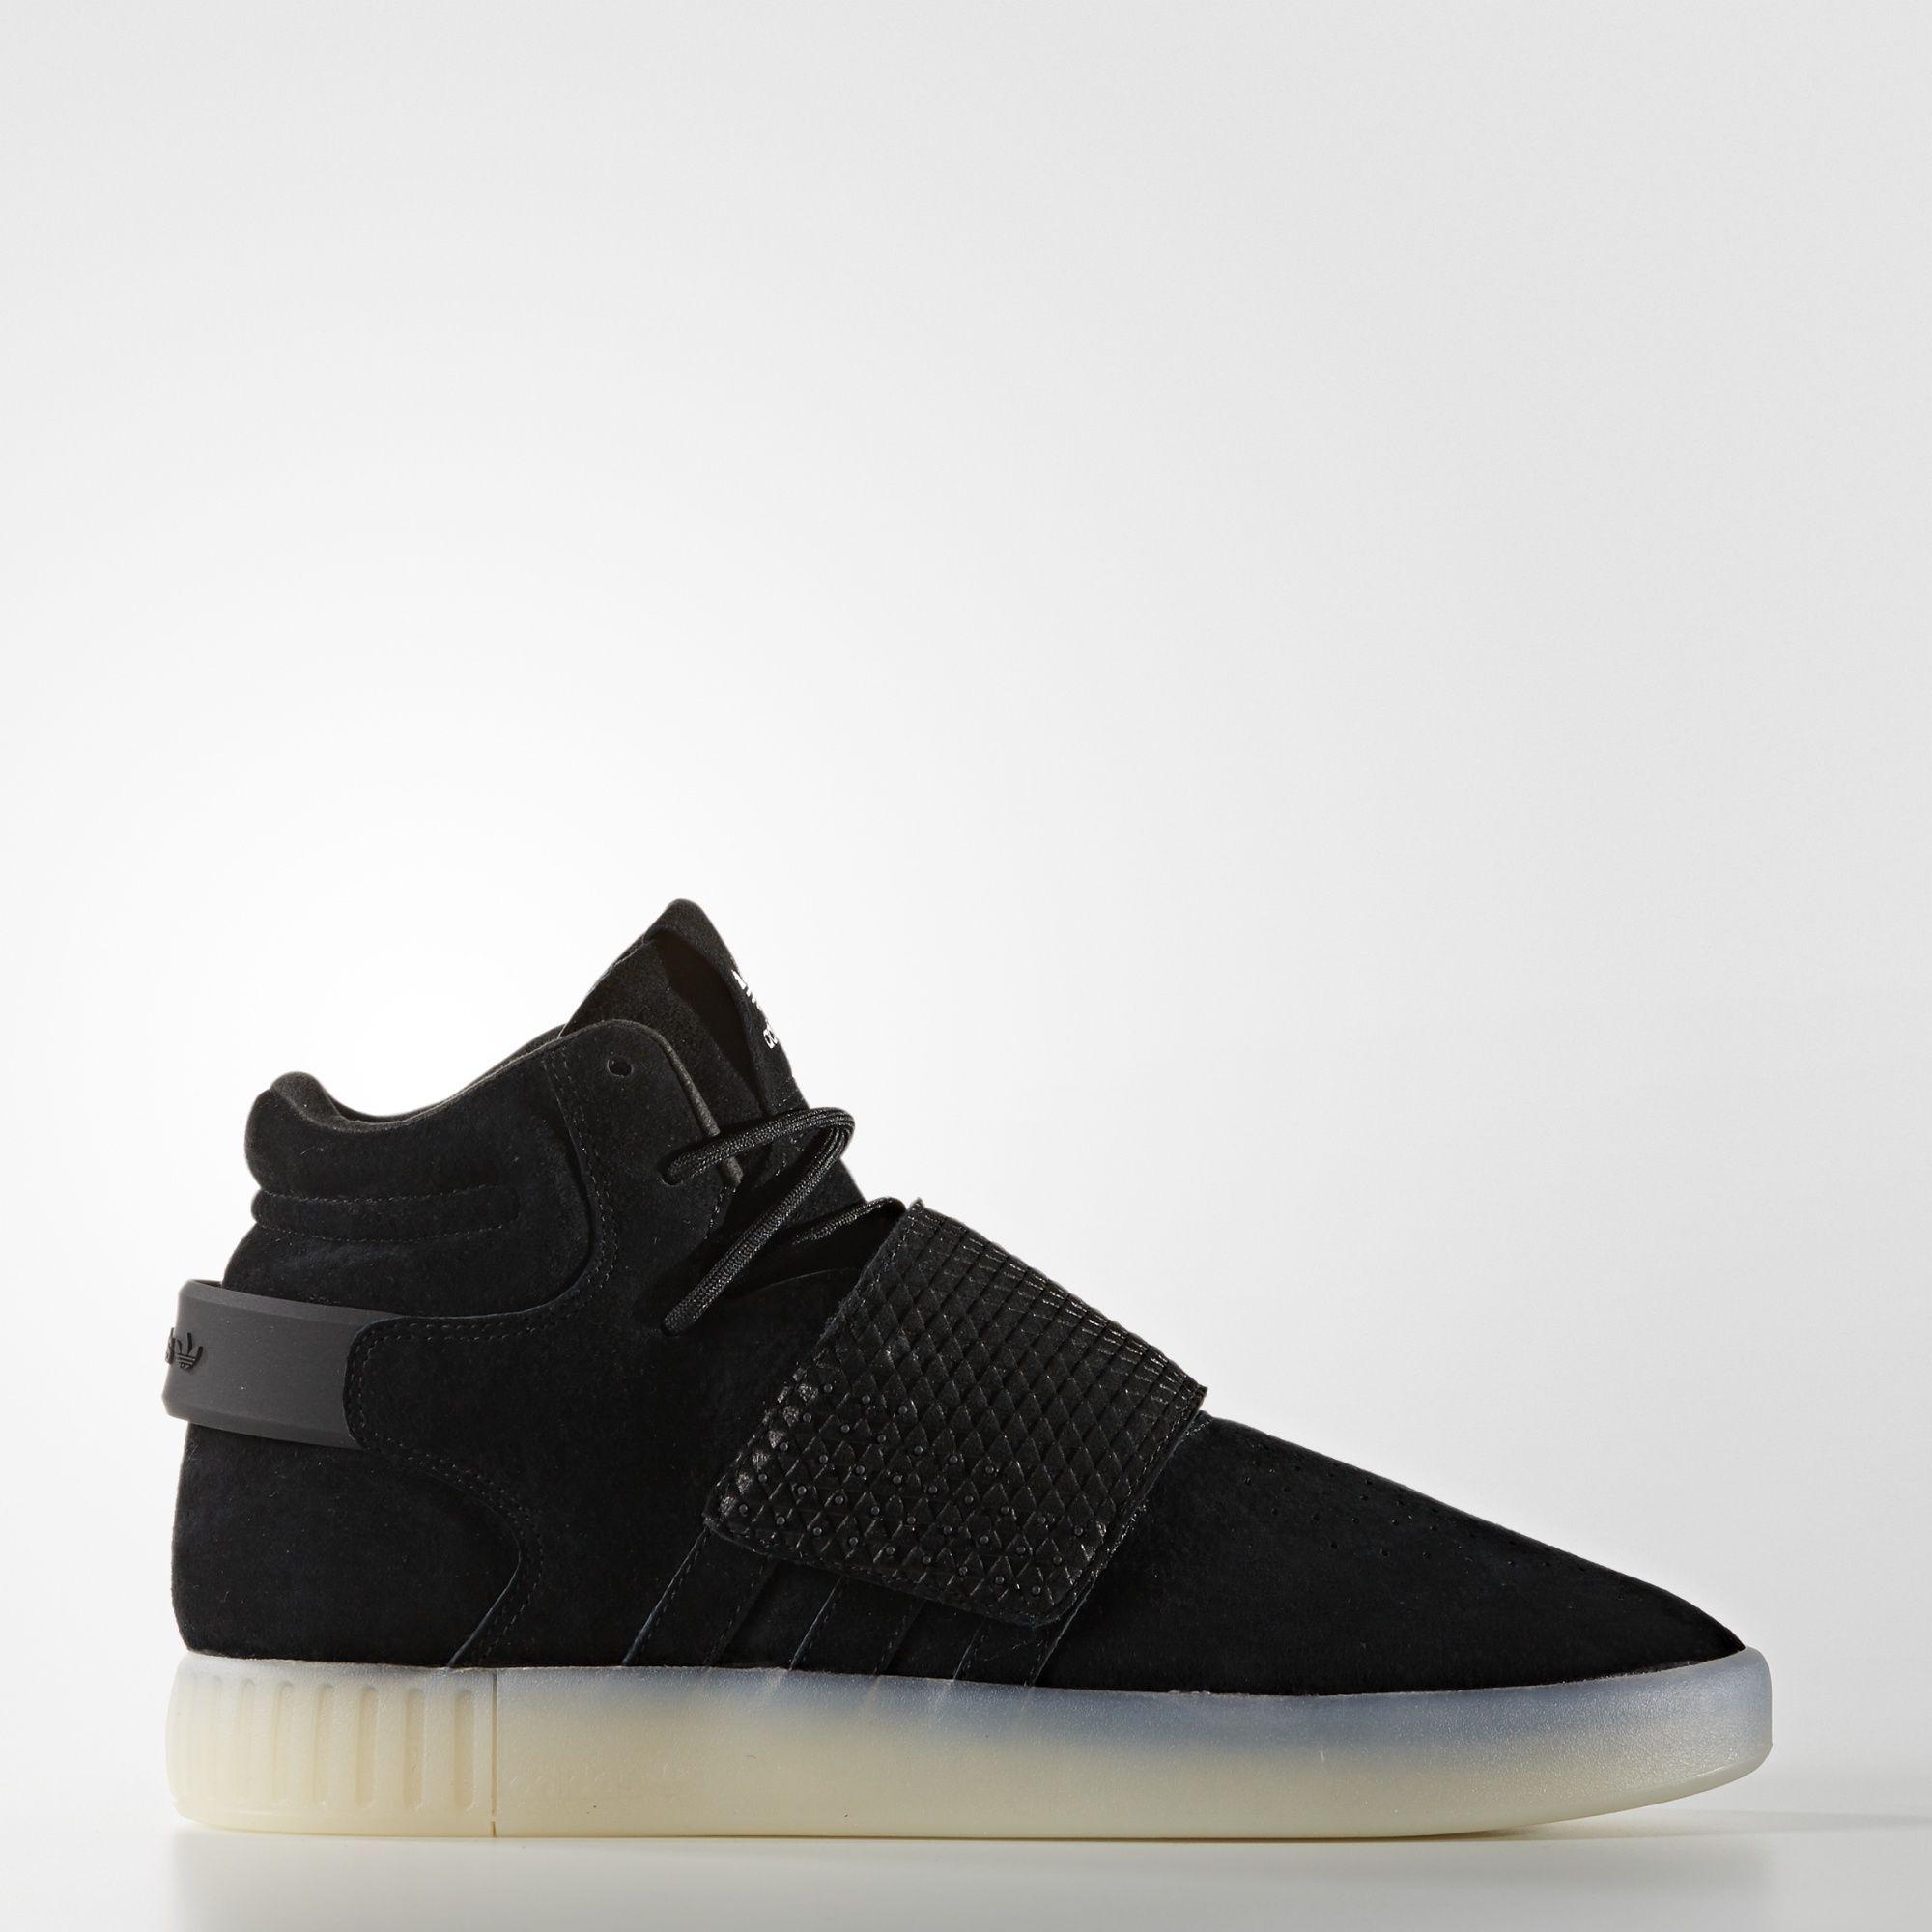 adidas - Tubular Invader Strap Shoes